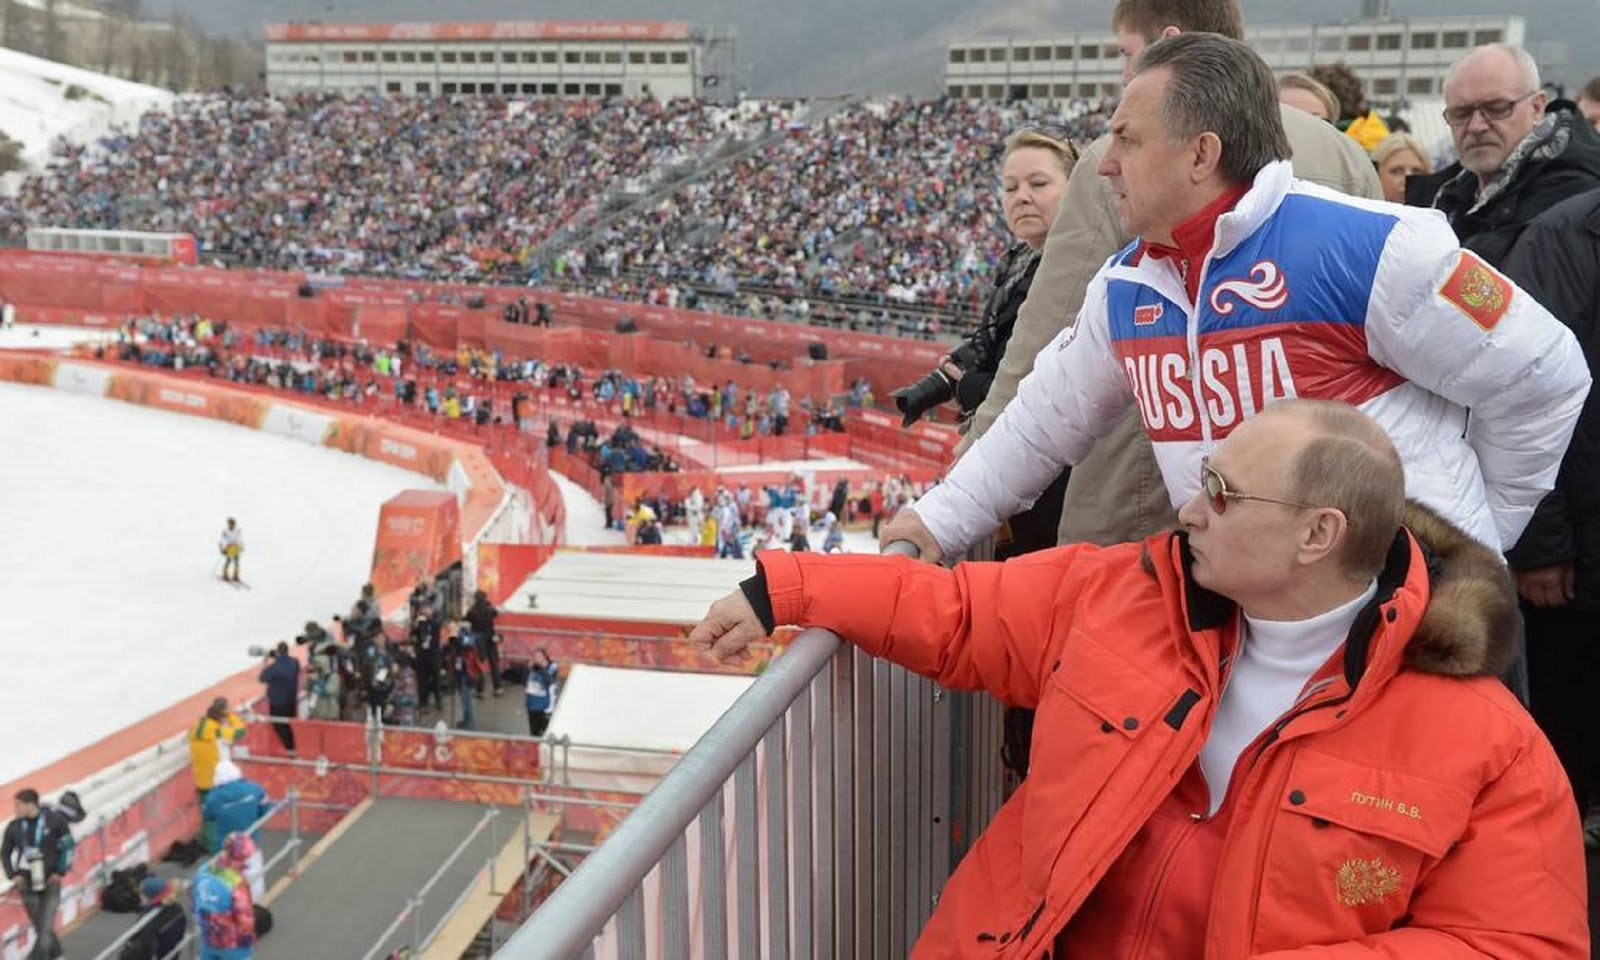 RUSSIA 2016 OLYMPICS